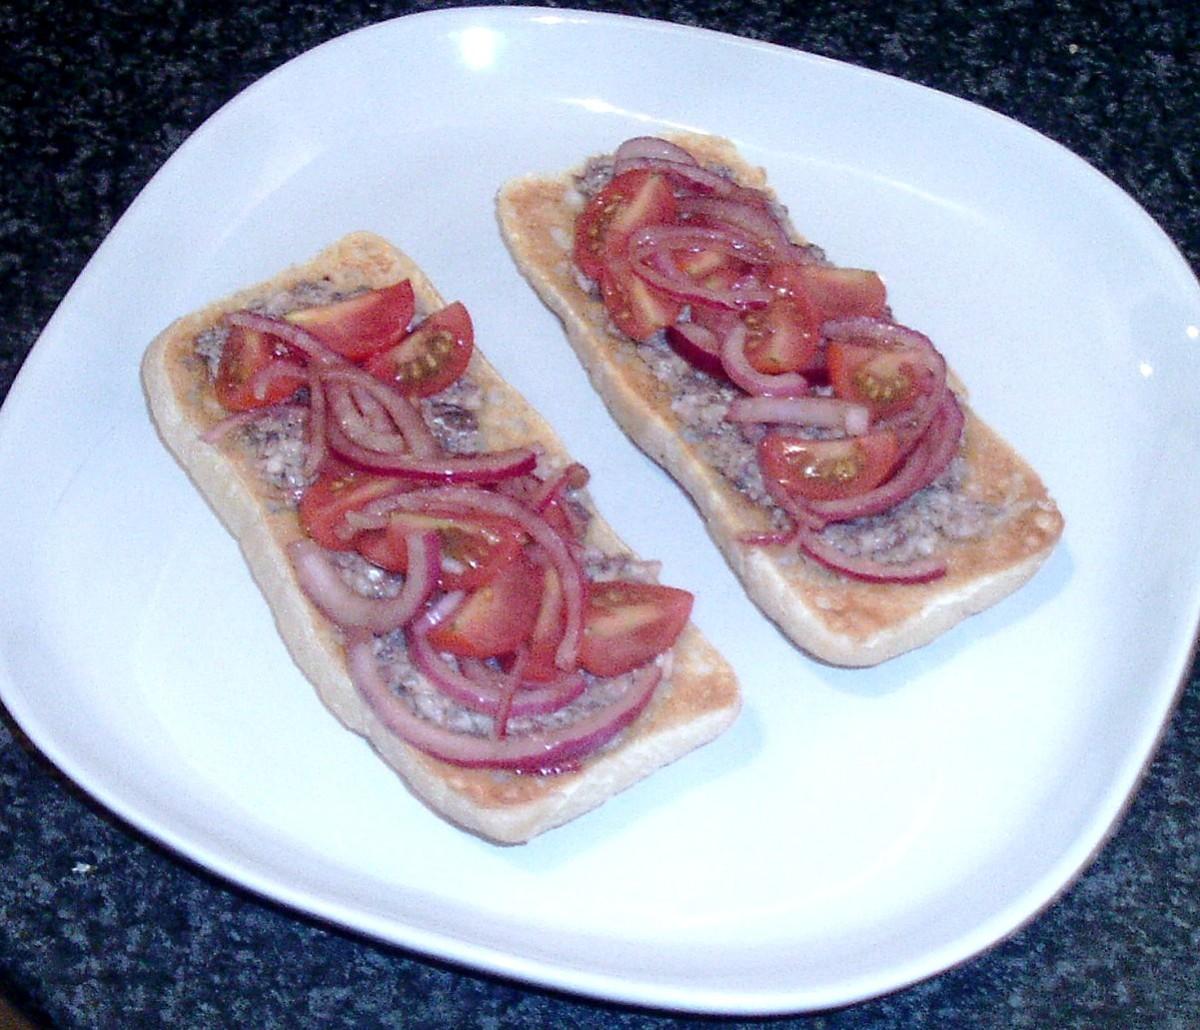 Mashed sardines on bruschetta with balsamic salad